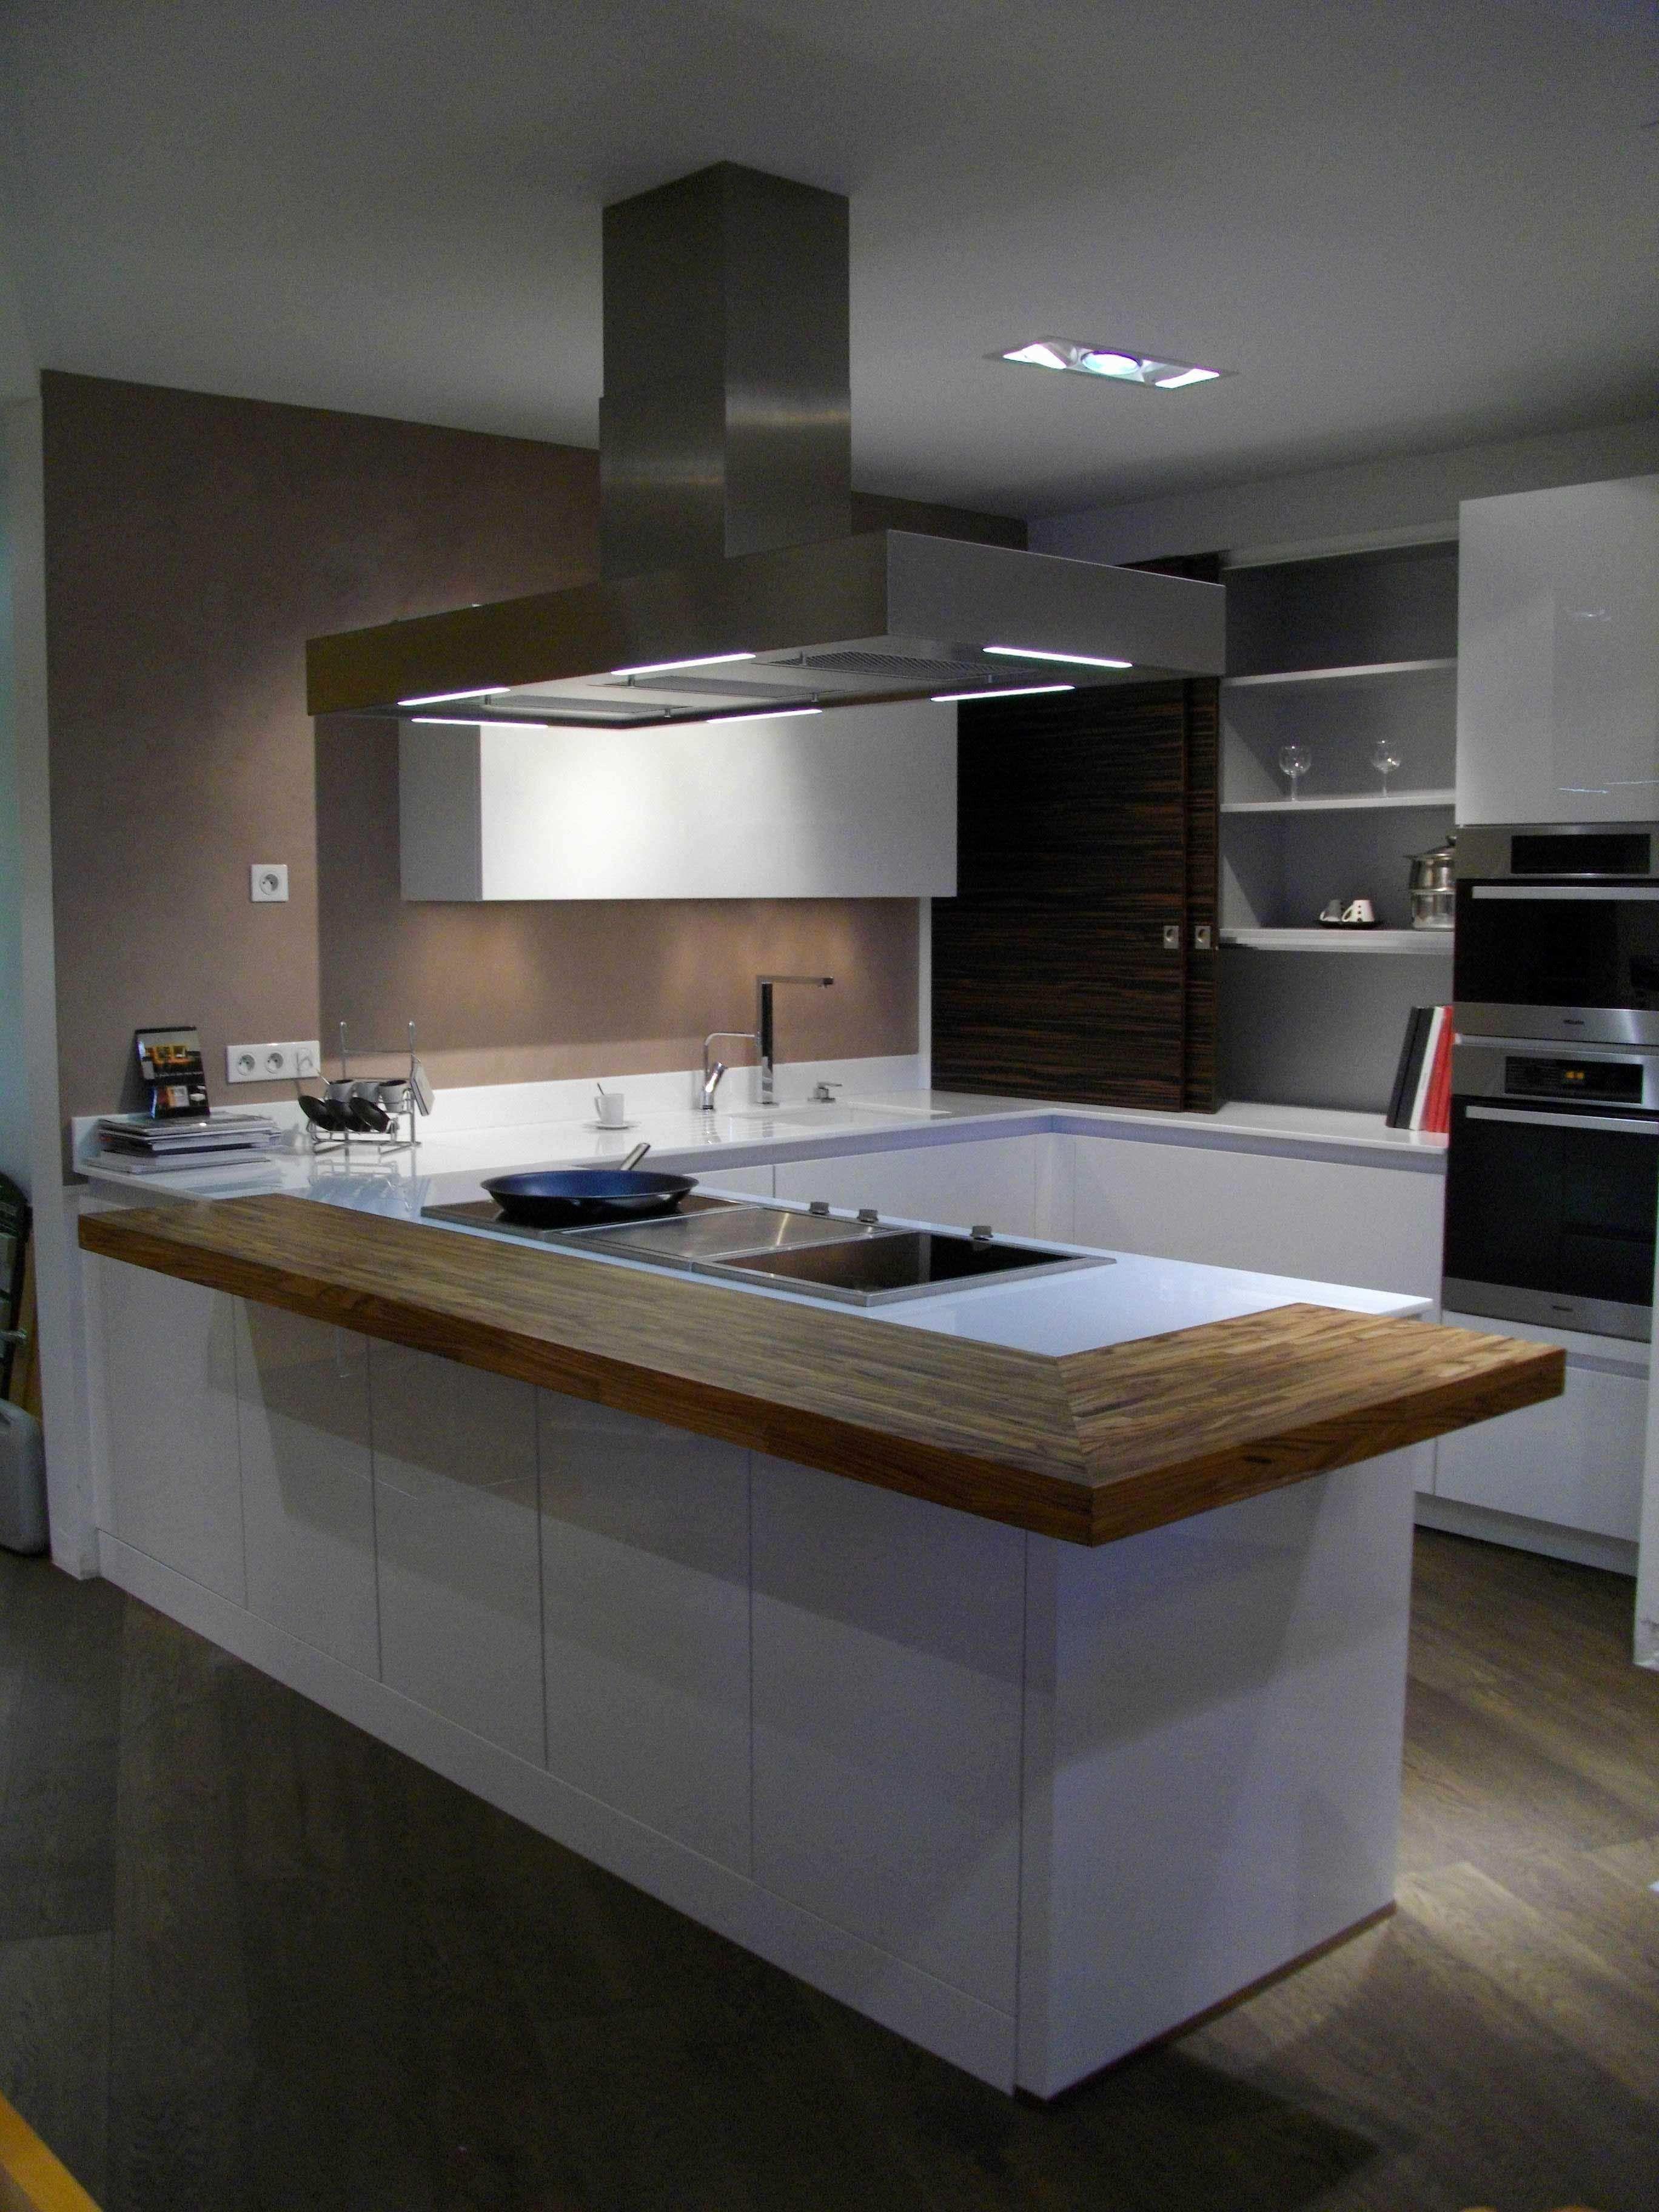 Inspirational Logiciel Ikea Interior Design Kitchen Small Kitchen Island Design Minimalist Kitchen